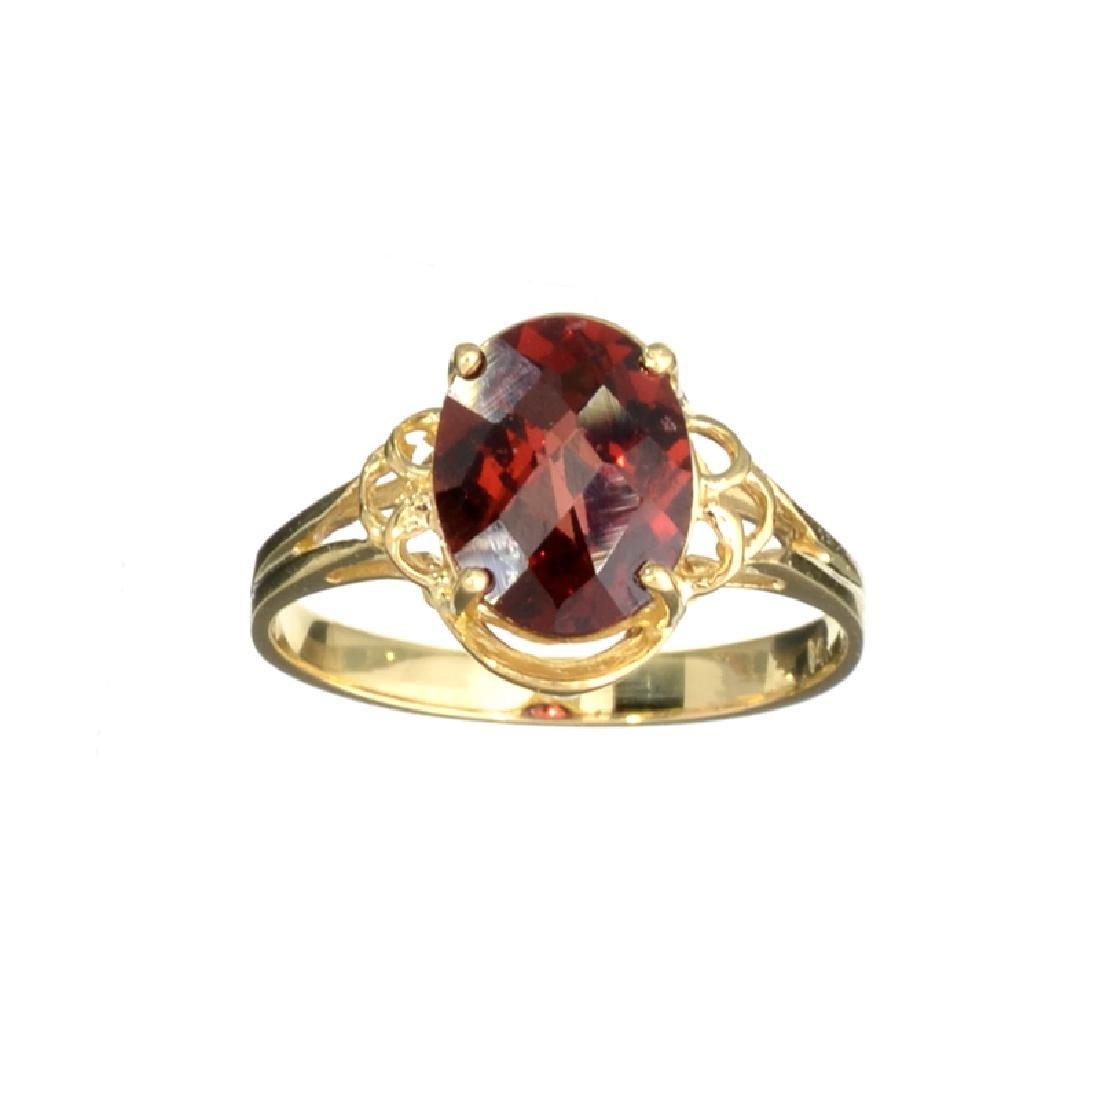 APP: 0.6k Fine Jewelry 14KT Gold, 3.21CT Oval Cut Red